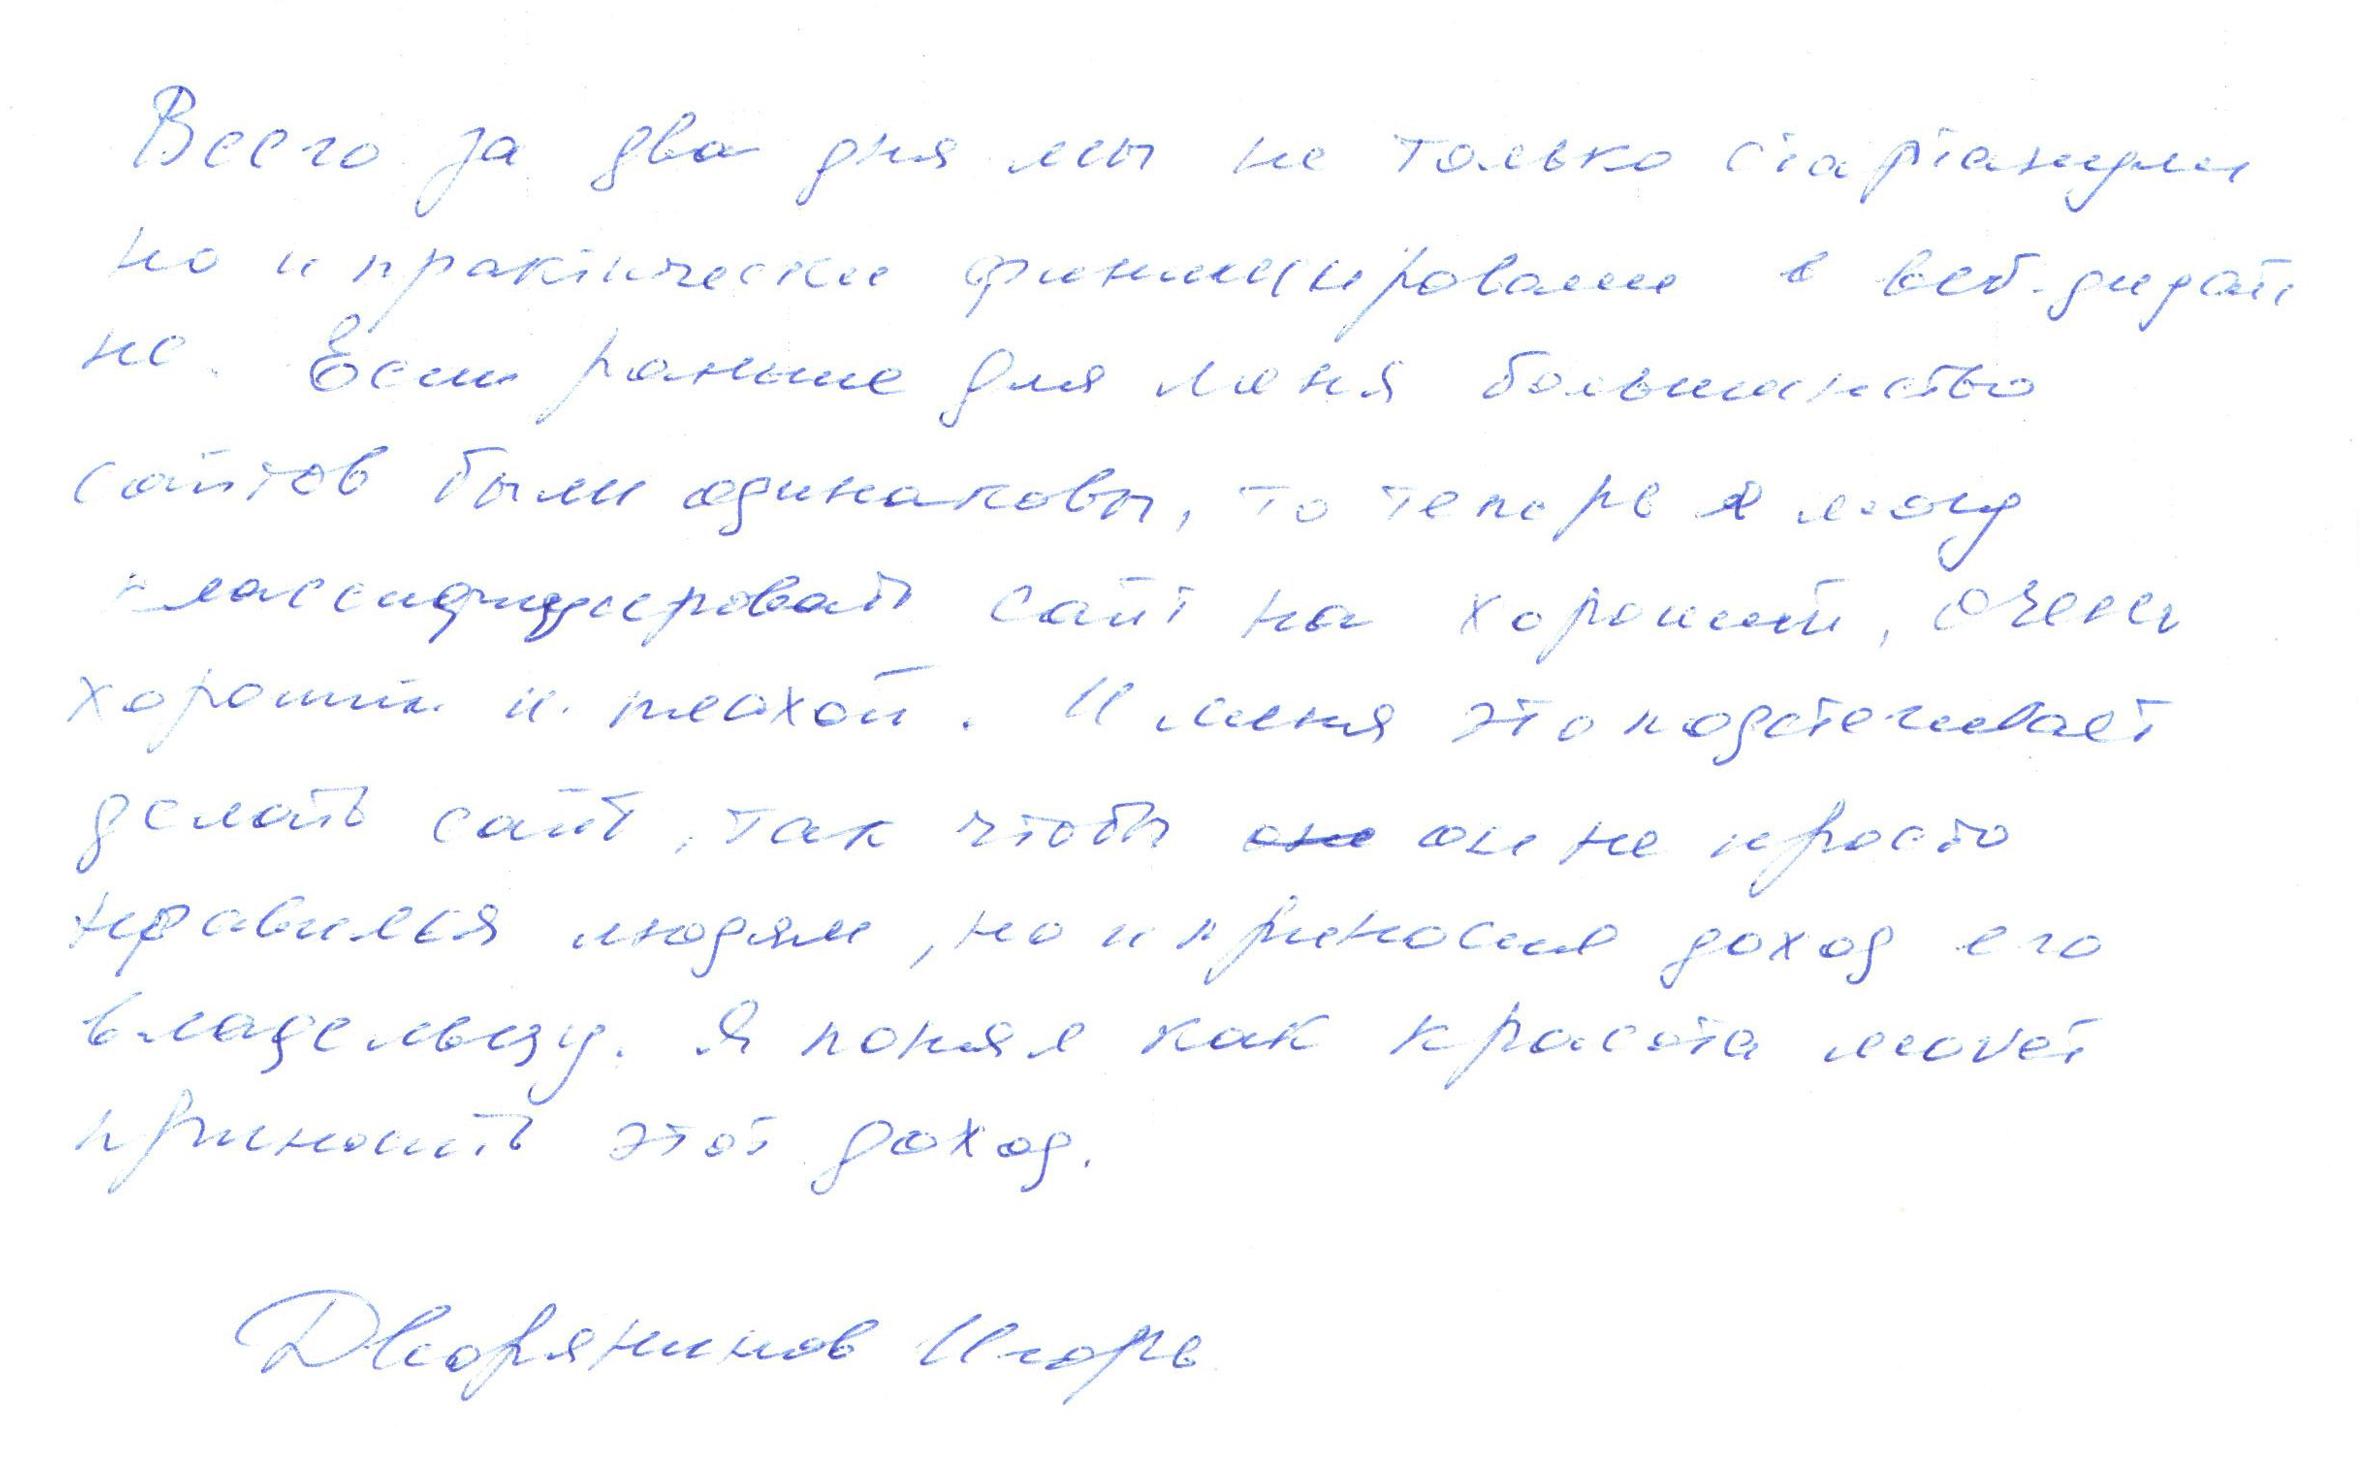 отзыв об интенсиве Данила Фимушкина в Самаре Дворяниного Игоря